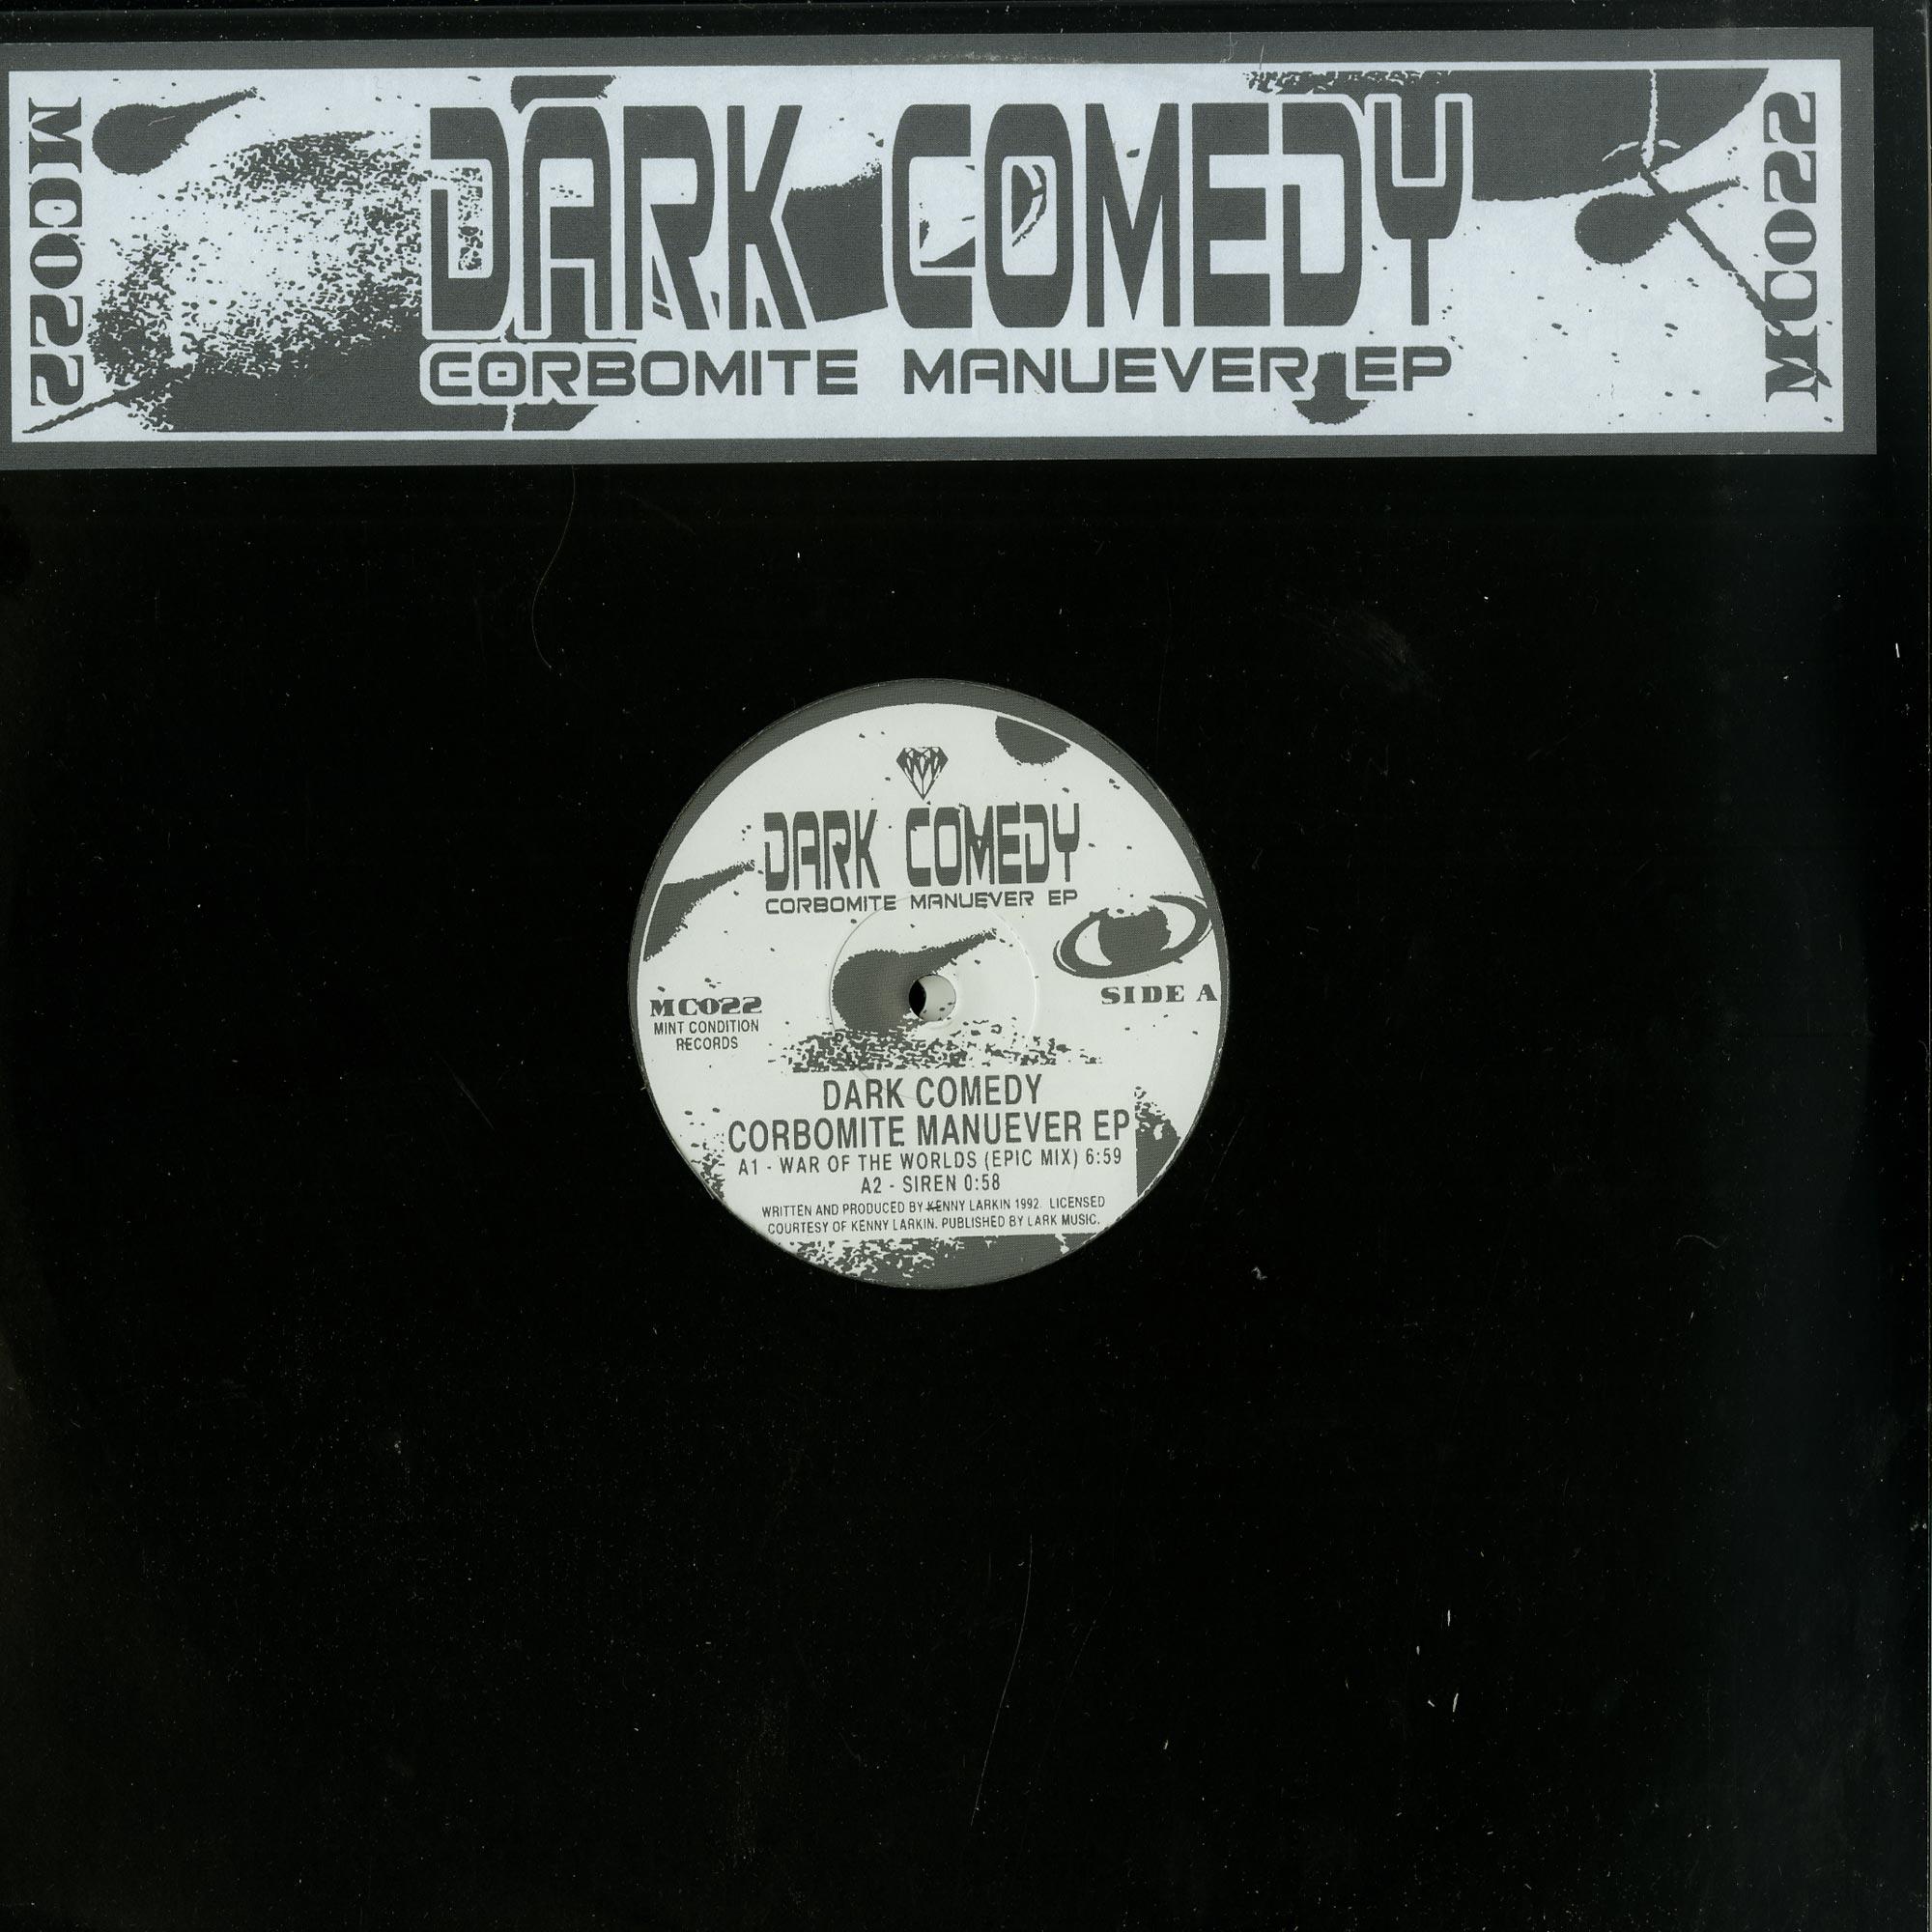 Dark Comedy  - CORBOMITE MANUEVER EP